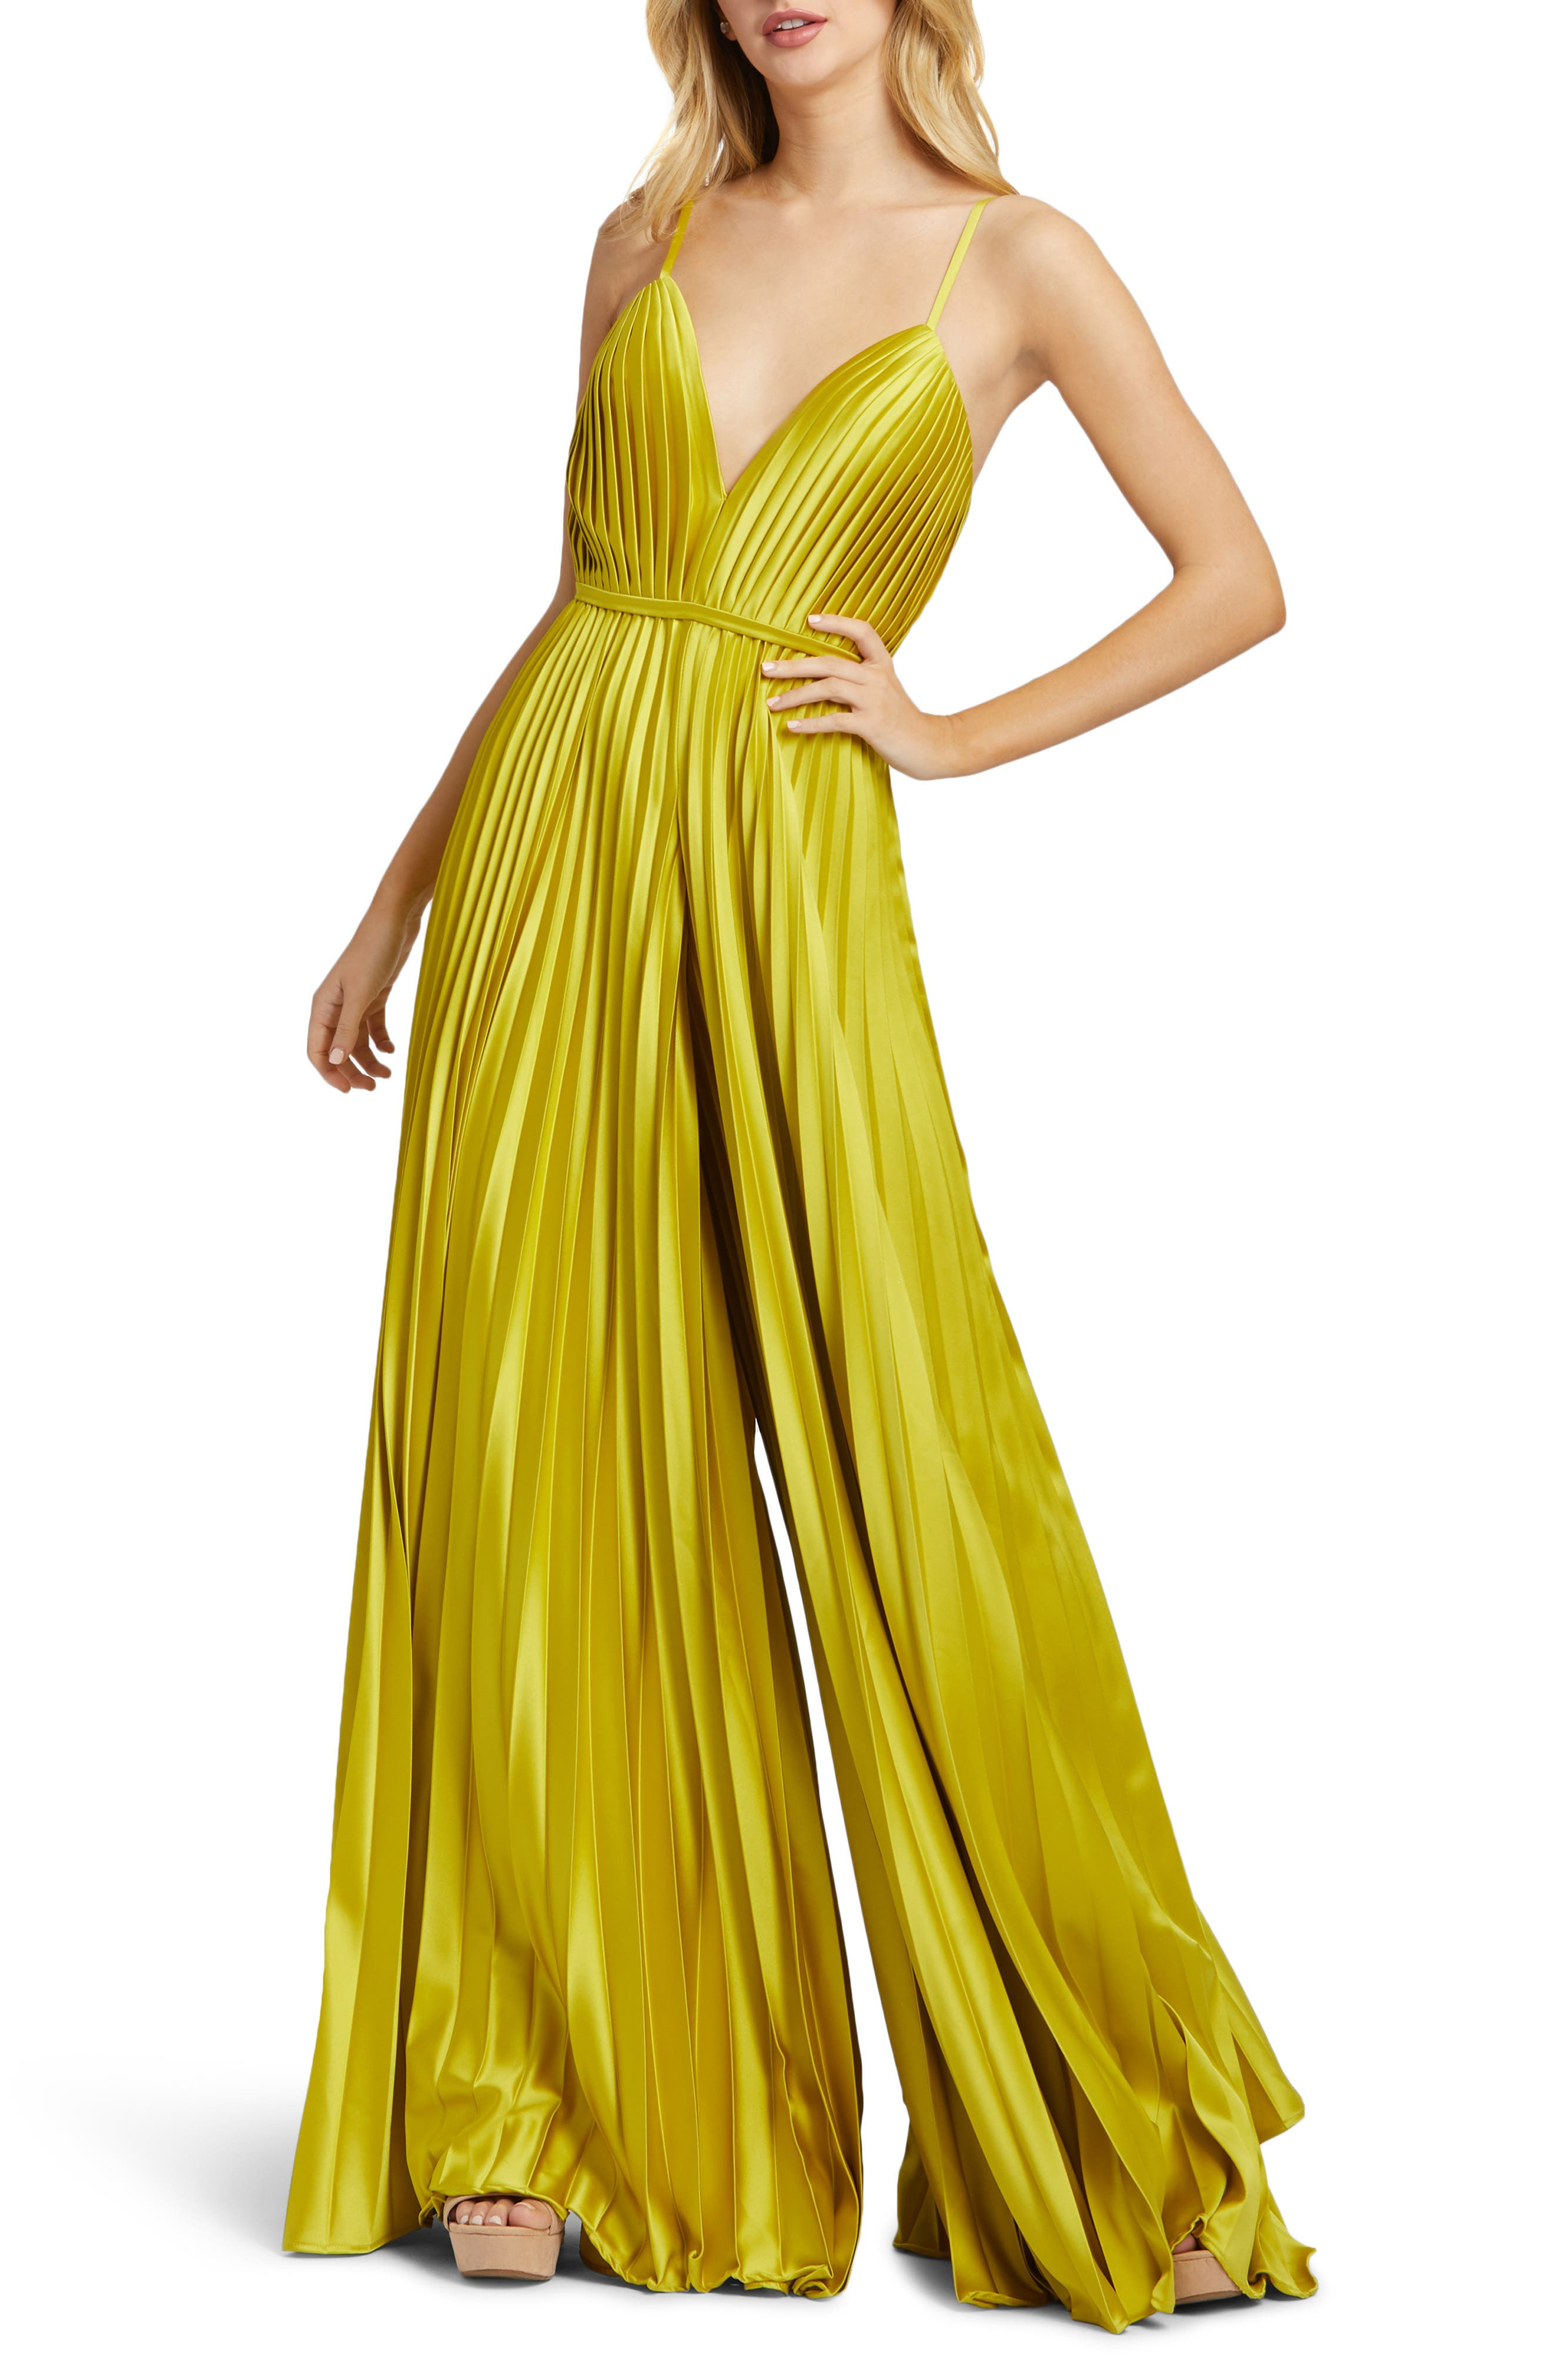 70s Dresses – Disco Dress, Hippie Dress, Wrap Dress Womens Ieena For MAC Duggal Pleated Satin Wide Leg Jumpsuit Size 14 - Yellow $398.00 AT vintagedancer.com